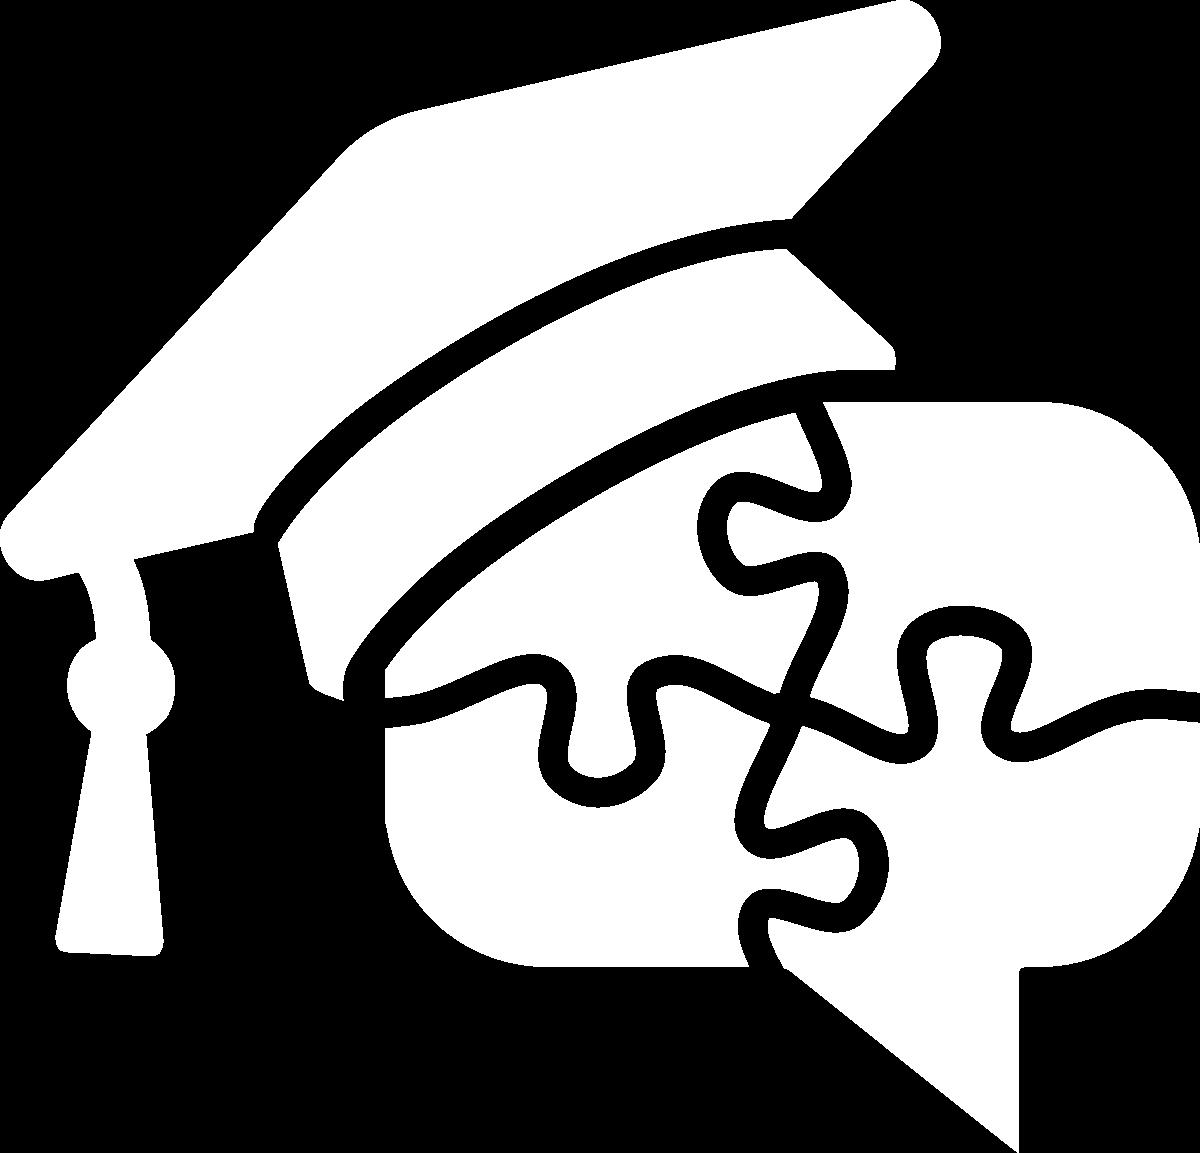 biele logo Akadémia samoukov